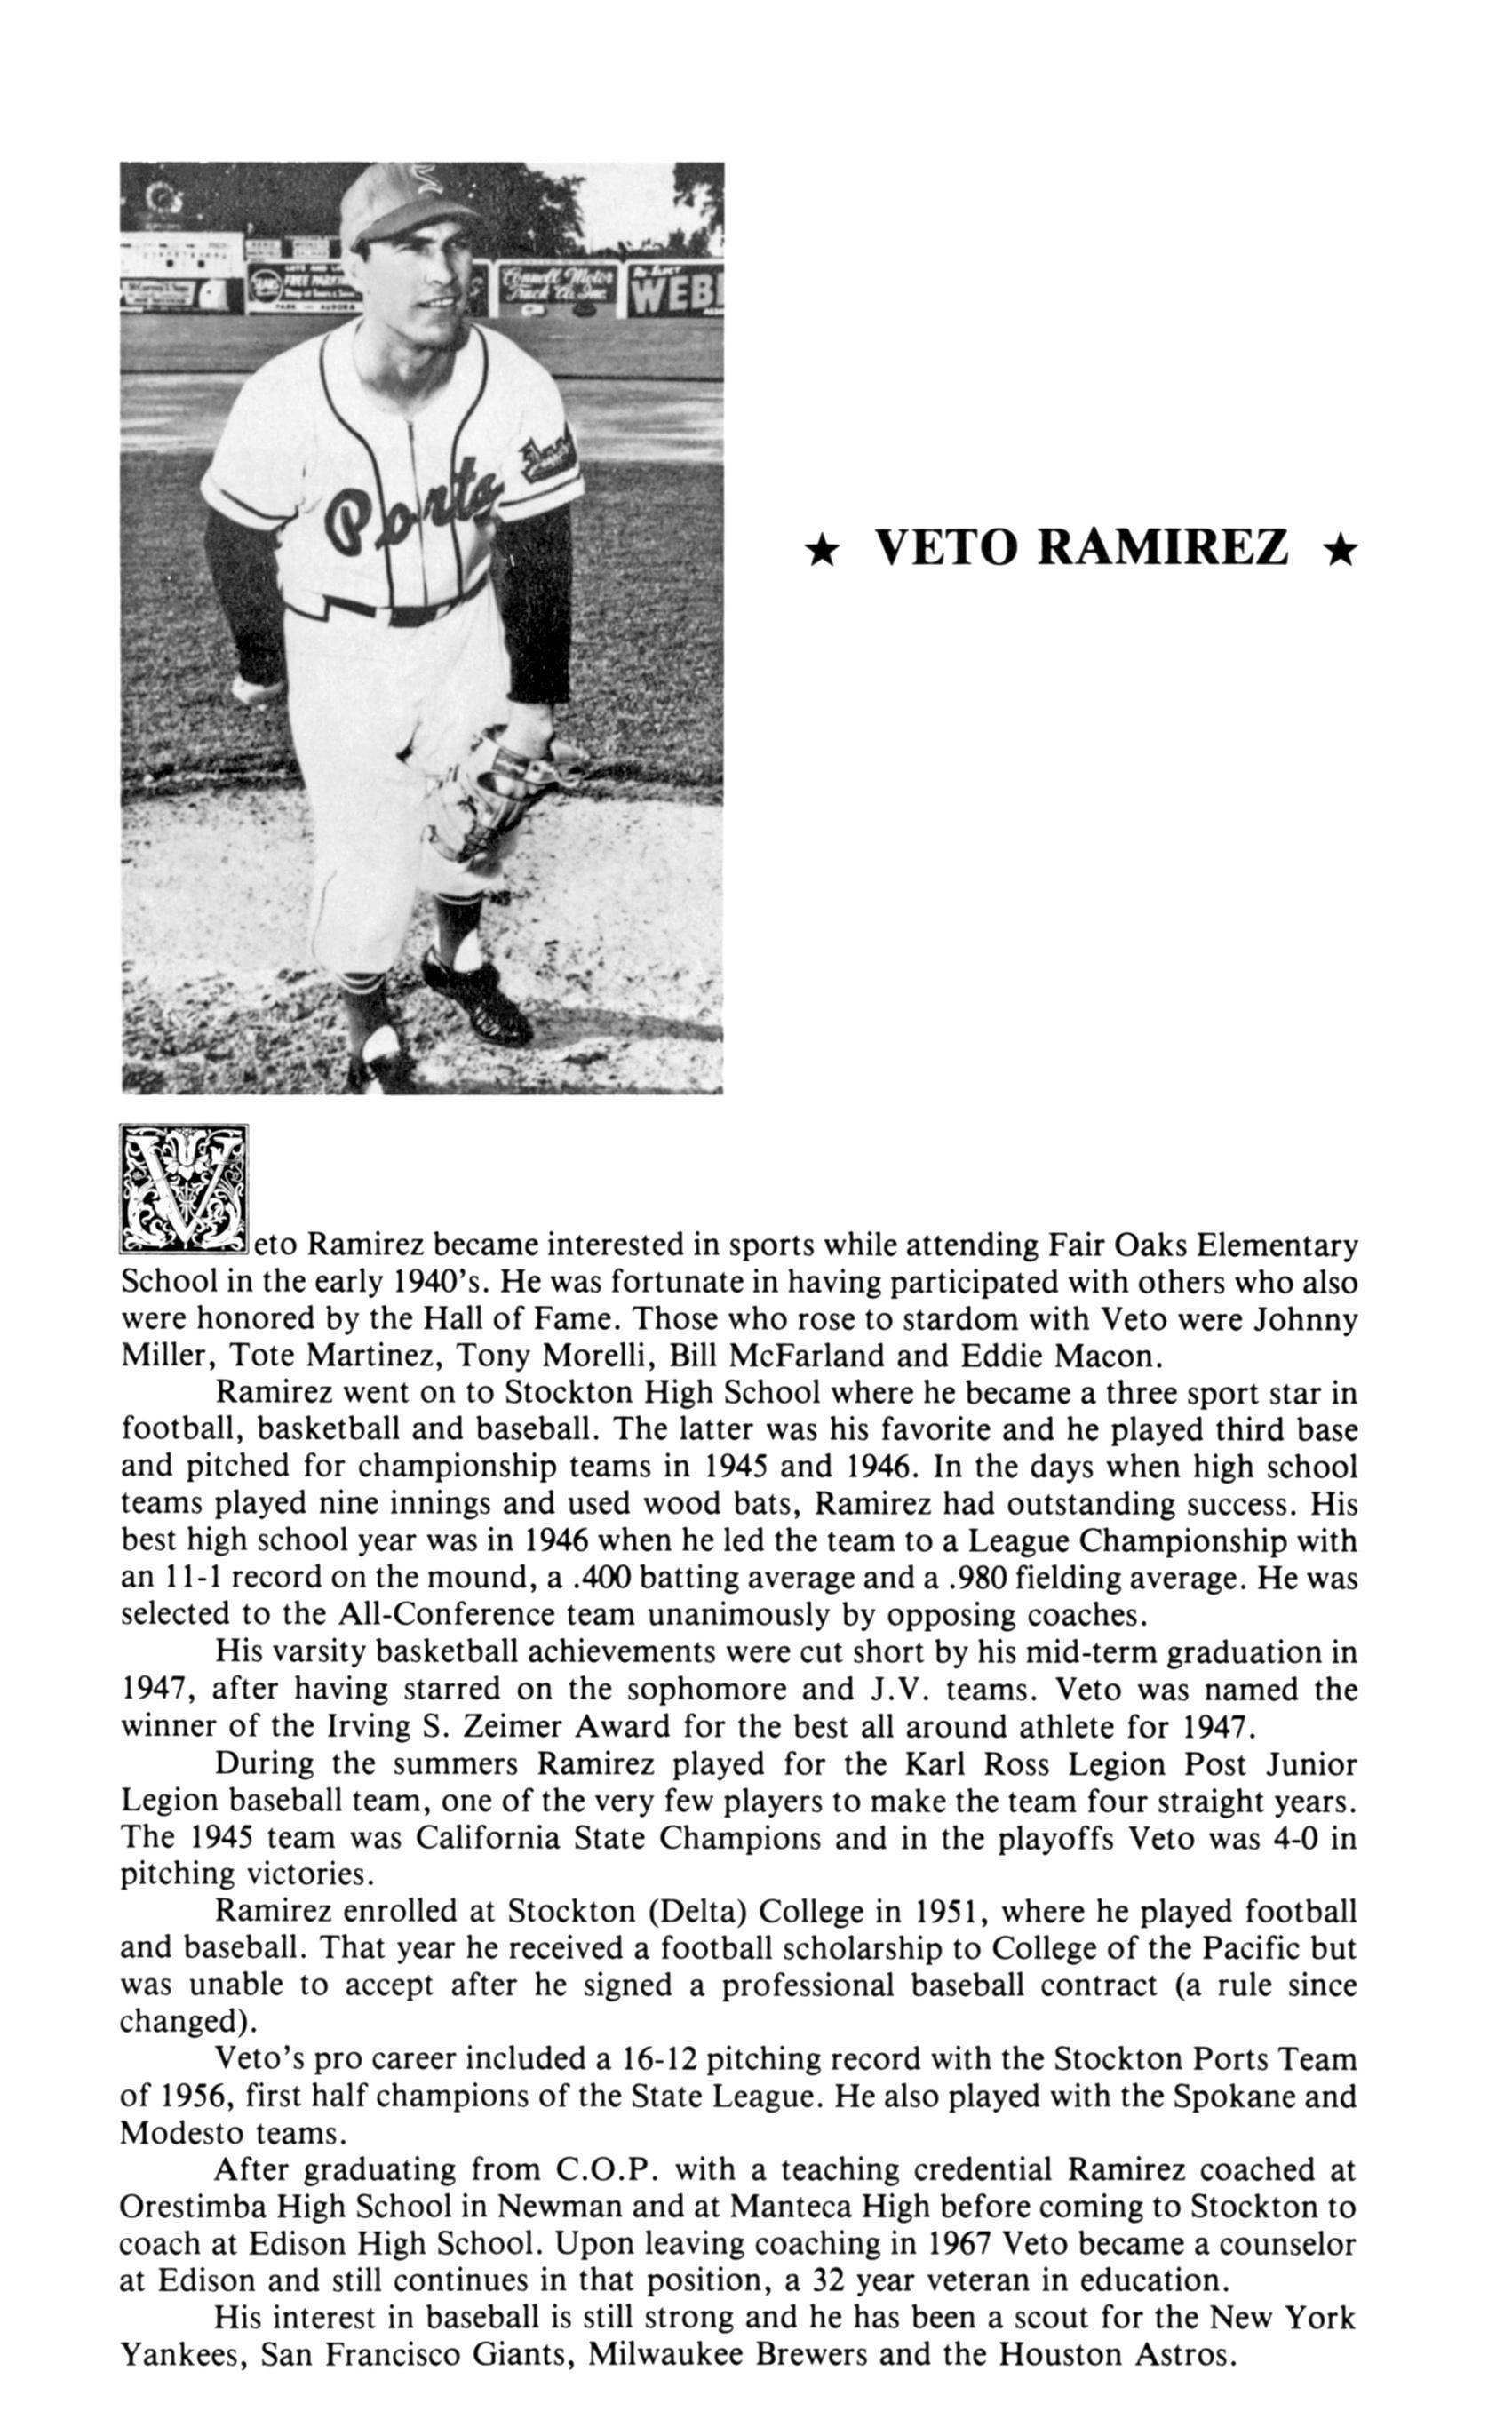 Veto-Ramirez-89_17